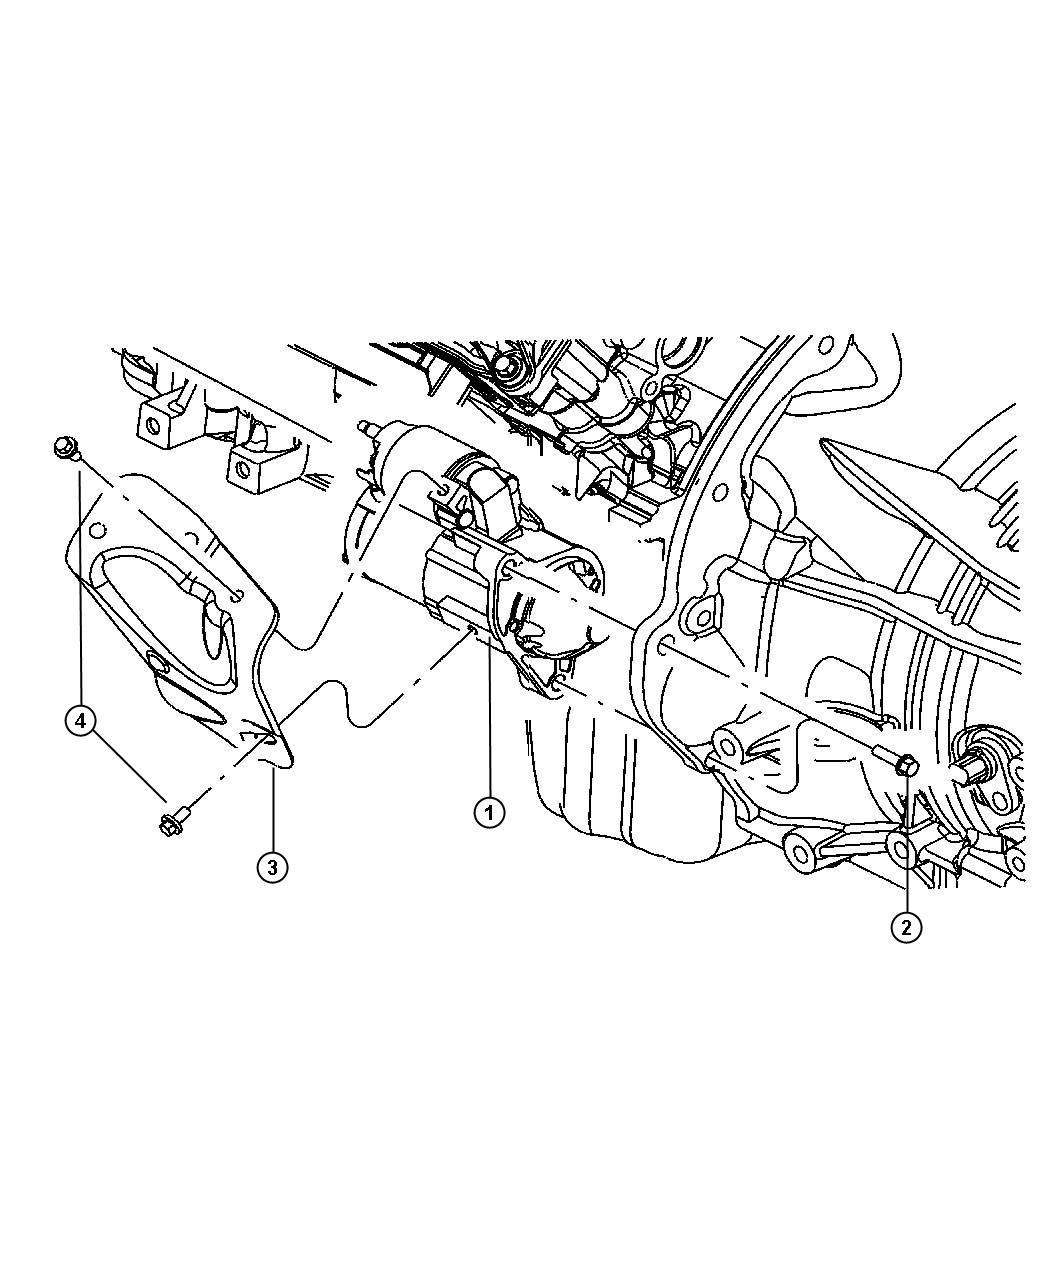 Jeep Grand Cherokee Engine Starters, Jeep, Free Engine